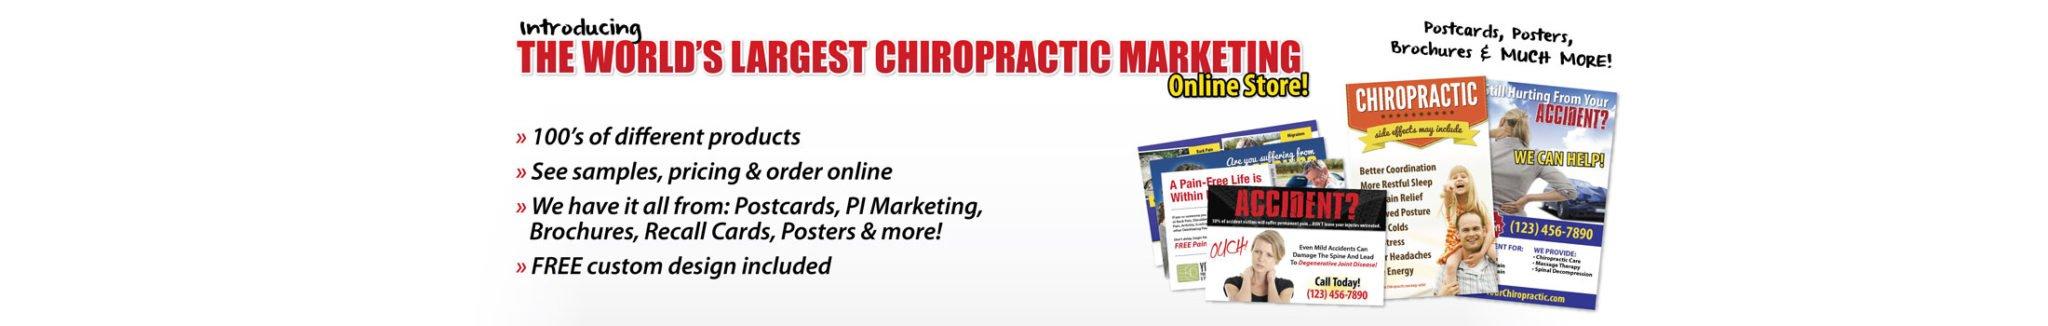 chiropractic marketing, new patient marketing, new patient postcards, chiropractic brochures, chiropractic business cards, chiropractic logos, chiropractic posters, chiropractic flyers, chiropractic print materials